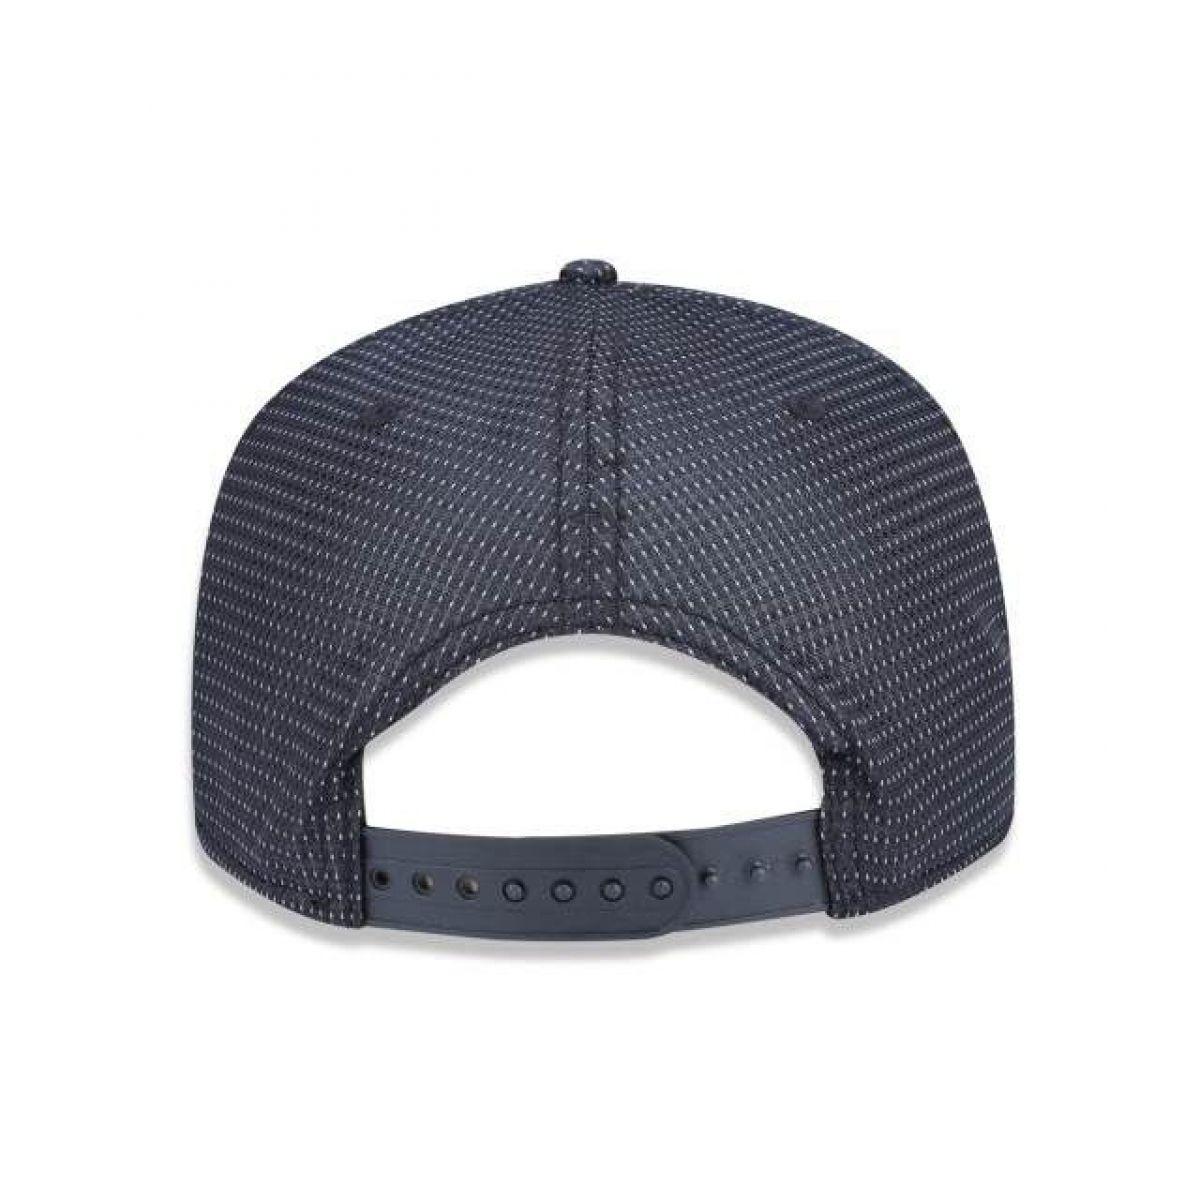 Boné New Era 950 Of Sn Core Nec Nyc Blkgrh - PRETO